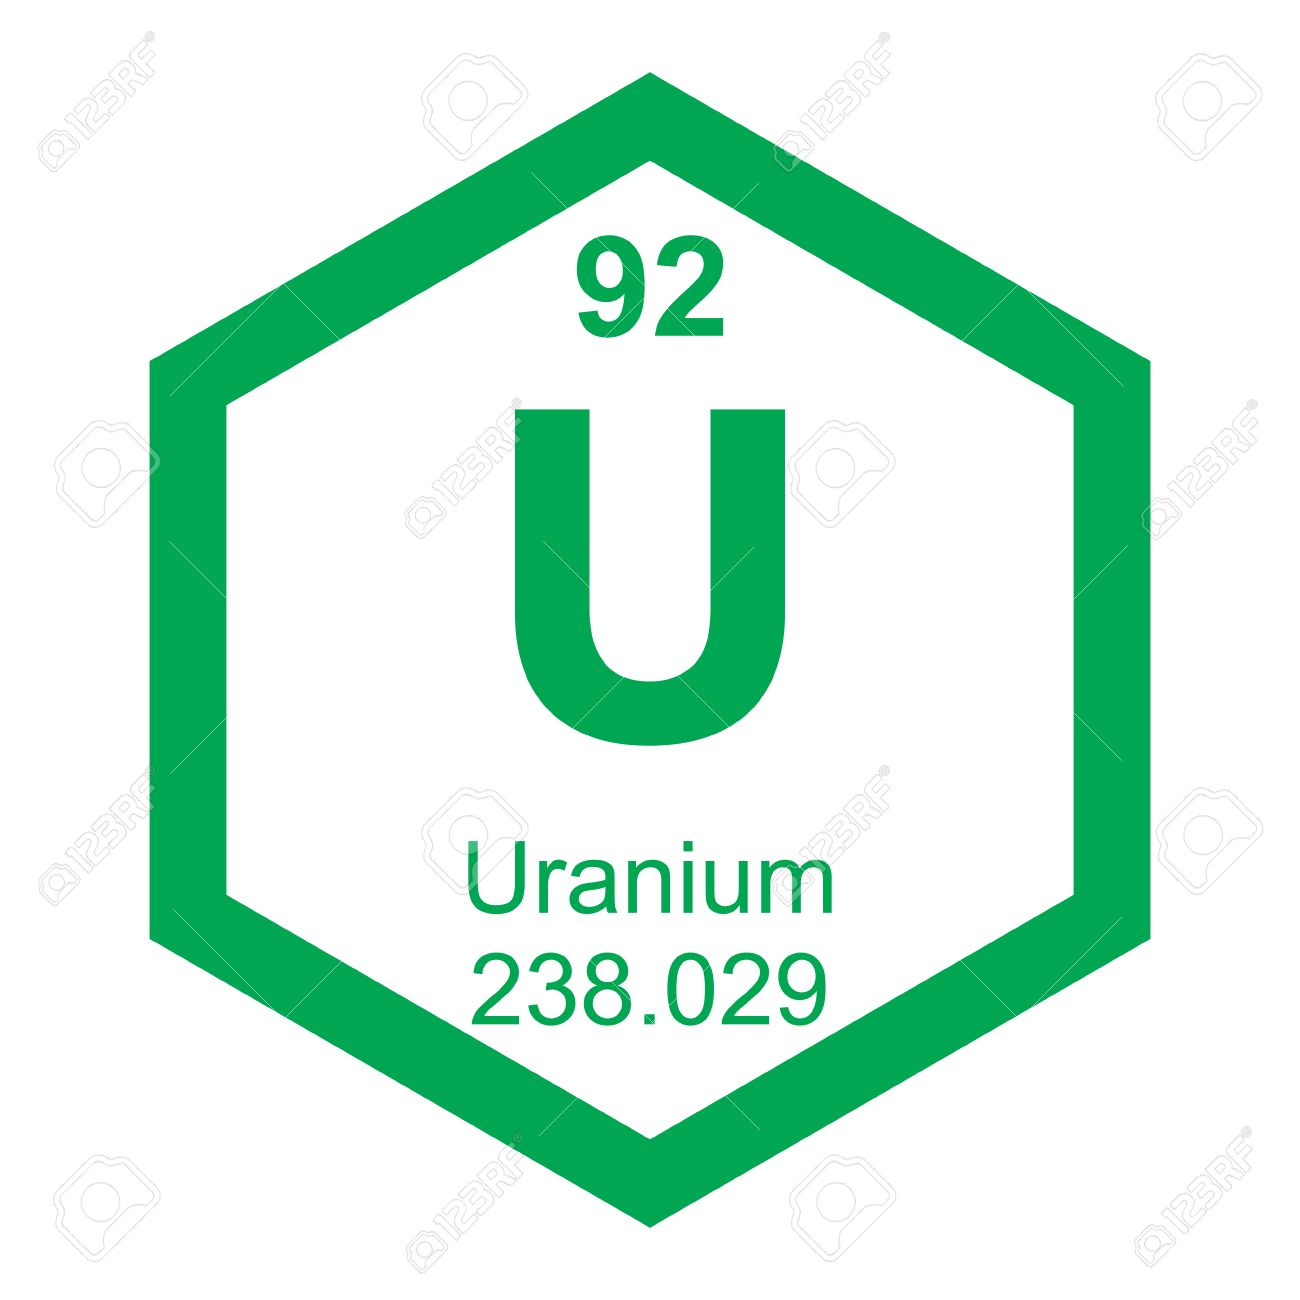 Periodic table uranium royalty free cliparts vectors and stock periodic table uranium stock vector 41243820 urtaz Choice Image